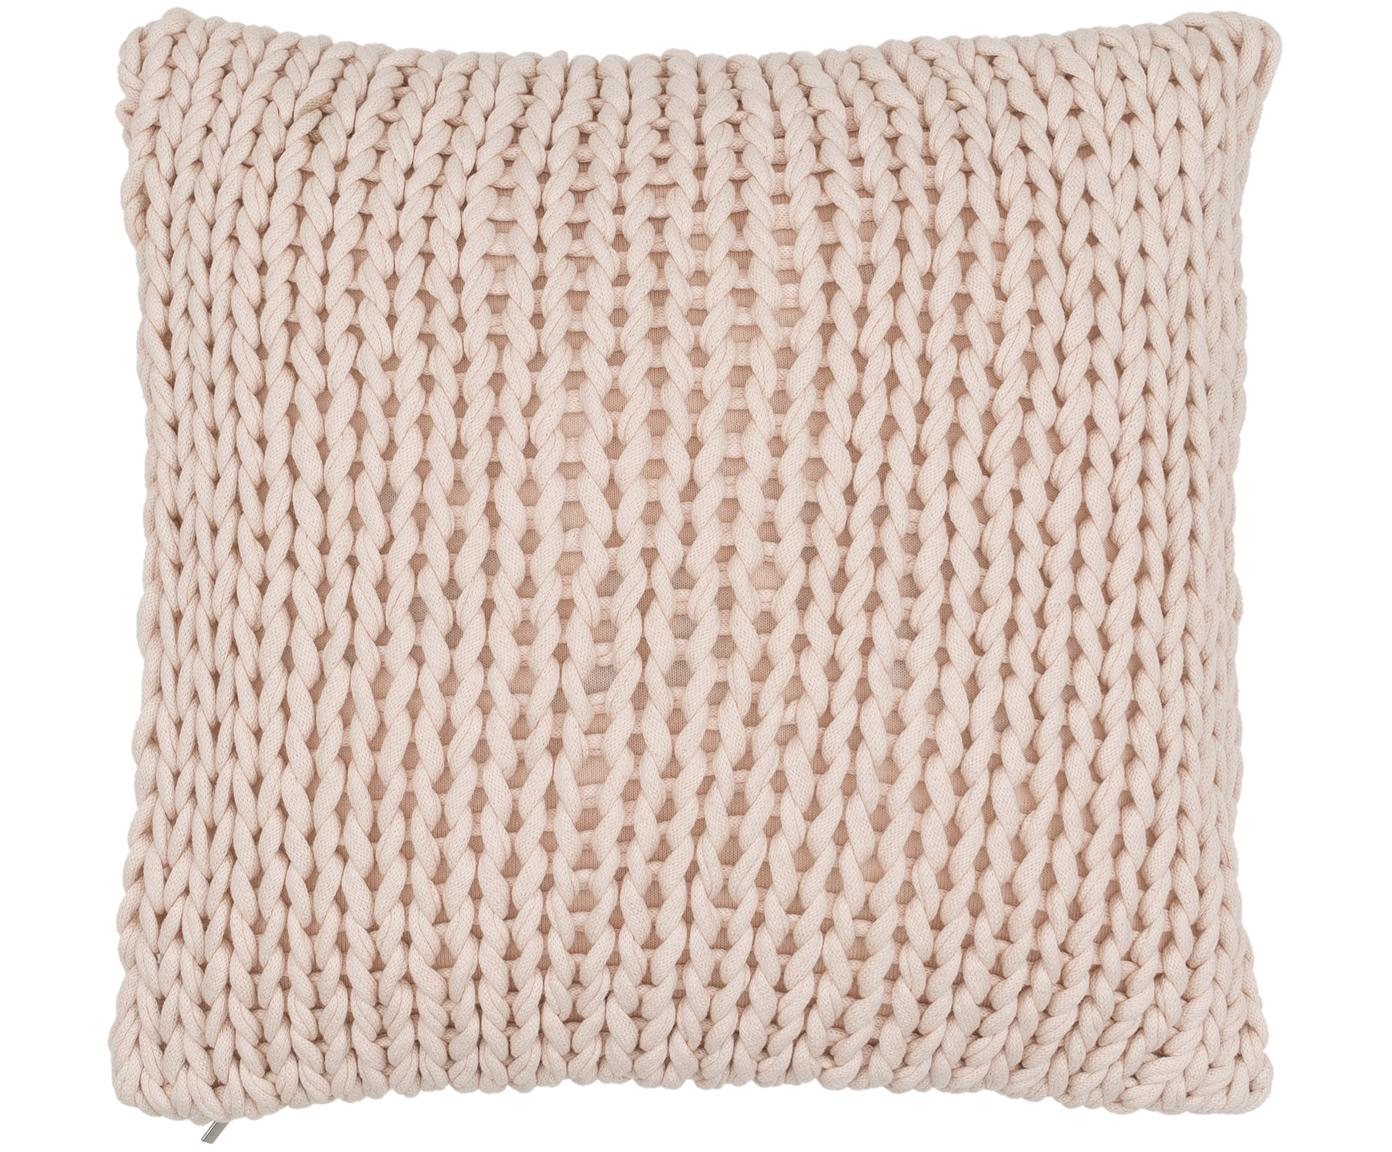 Kussenhoes Big Knit, Katoen, Poederroze, 50 x 50 cm